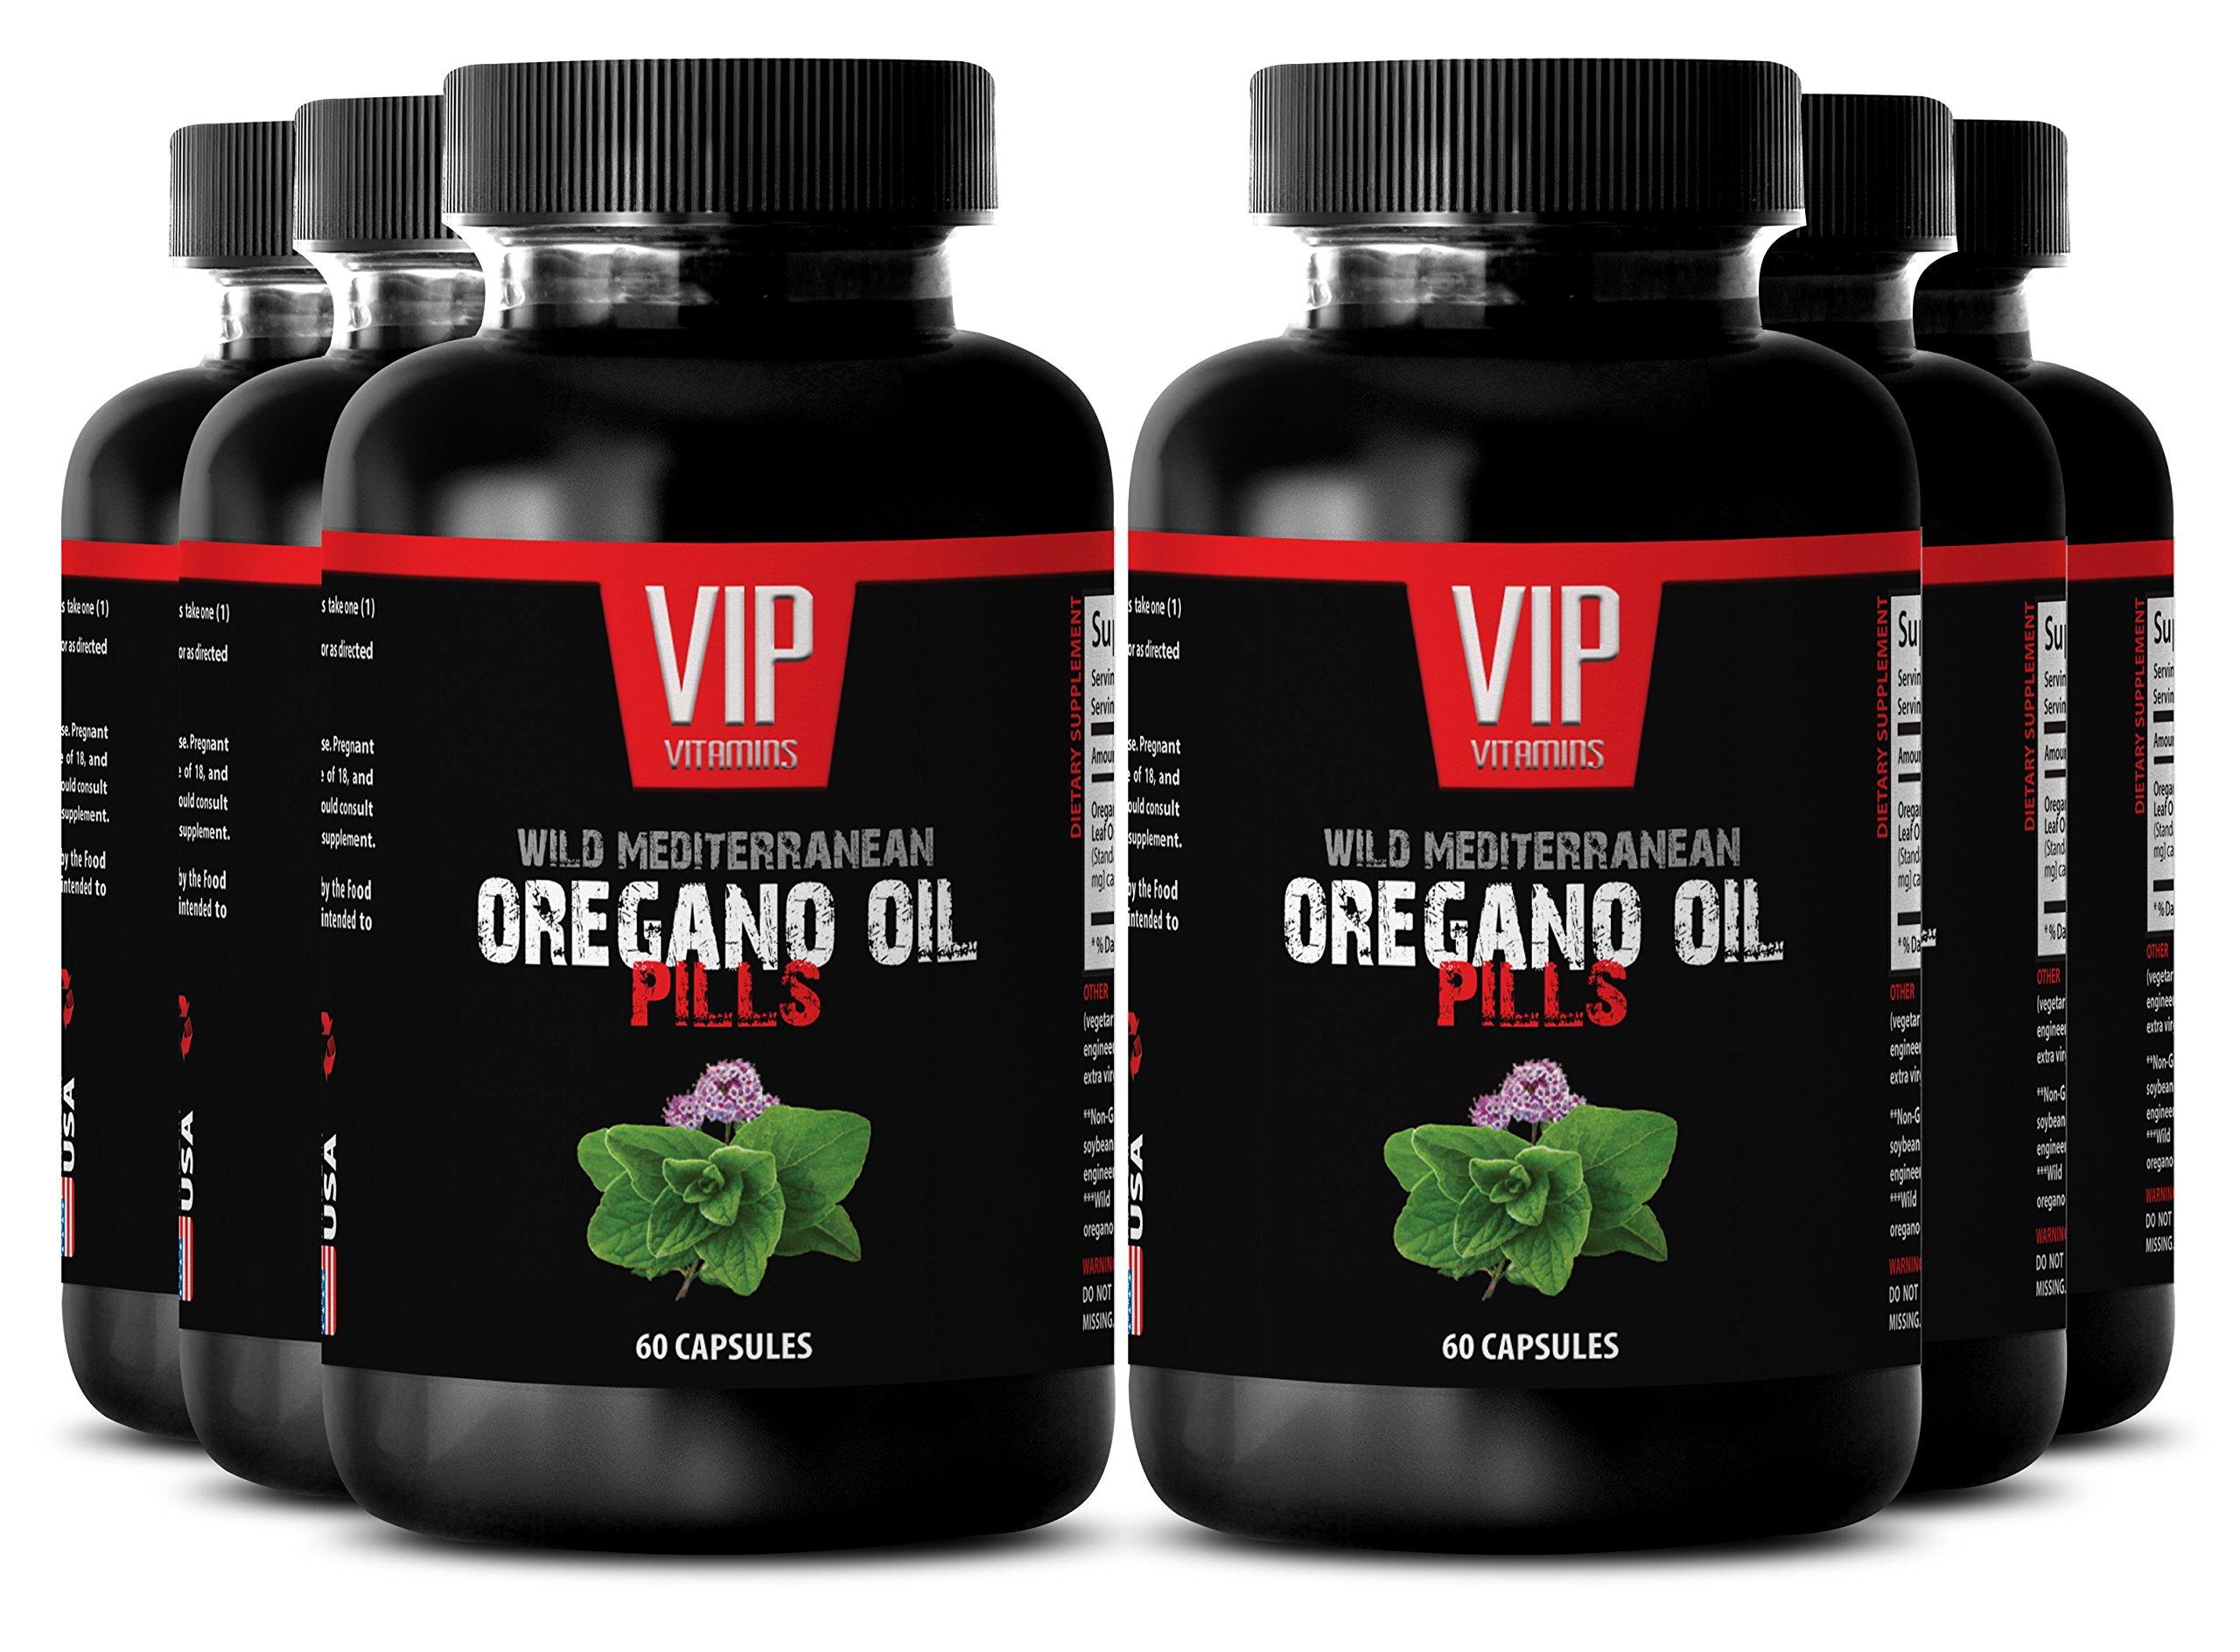 Mediterranean diet - Wild Mediterranean Oregano Oil 1500mg - Antifungal - 6 Bottles 360 Capsules by VIP VITAMINS